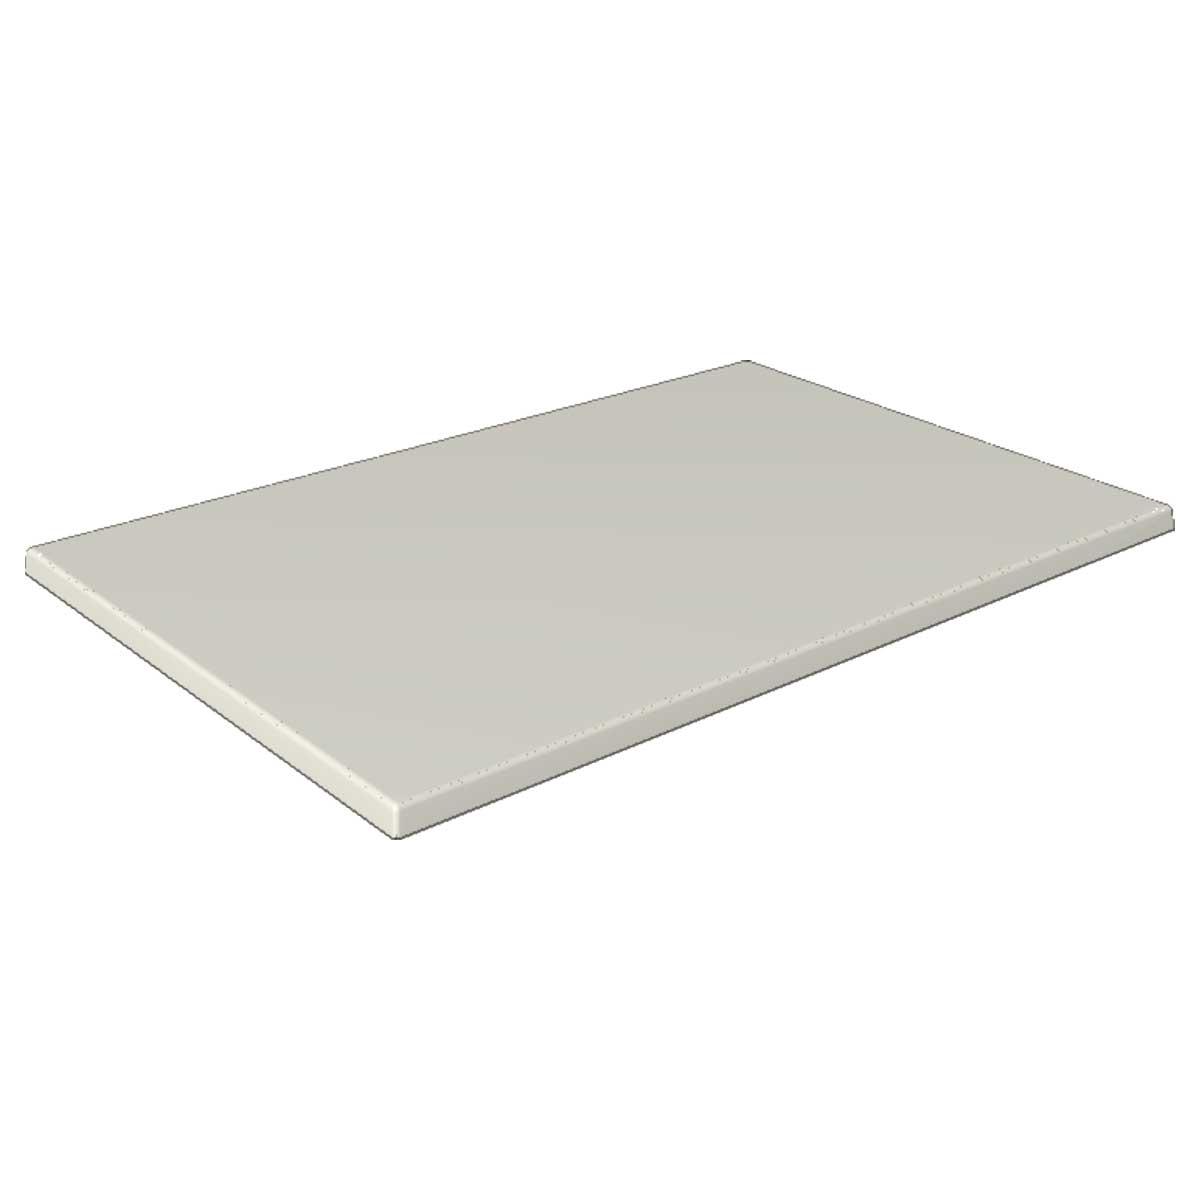 TICLA E120X80 001 - https://www.werzalit.com/fr/produit/plateau-de-table-classic-werzalit-e-80x60-001-weiss/